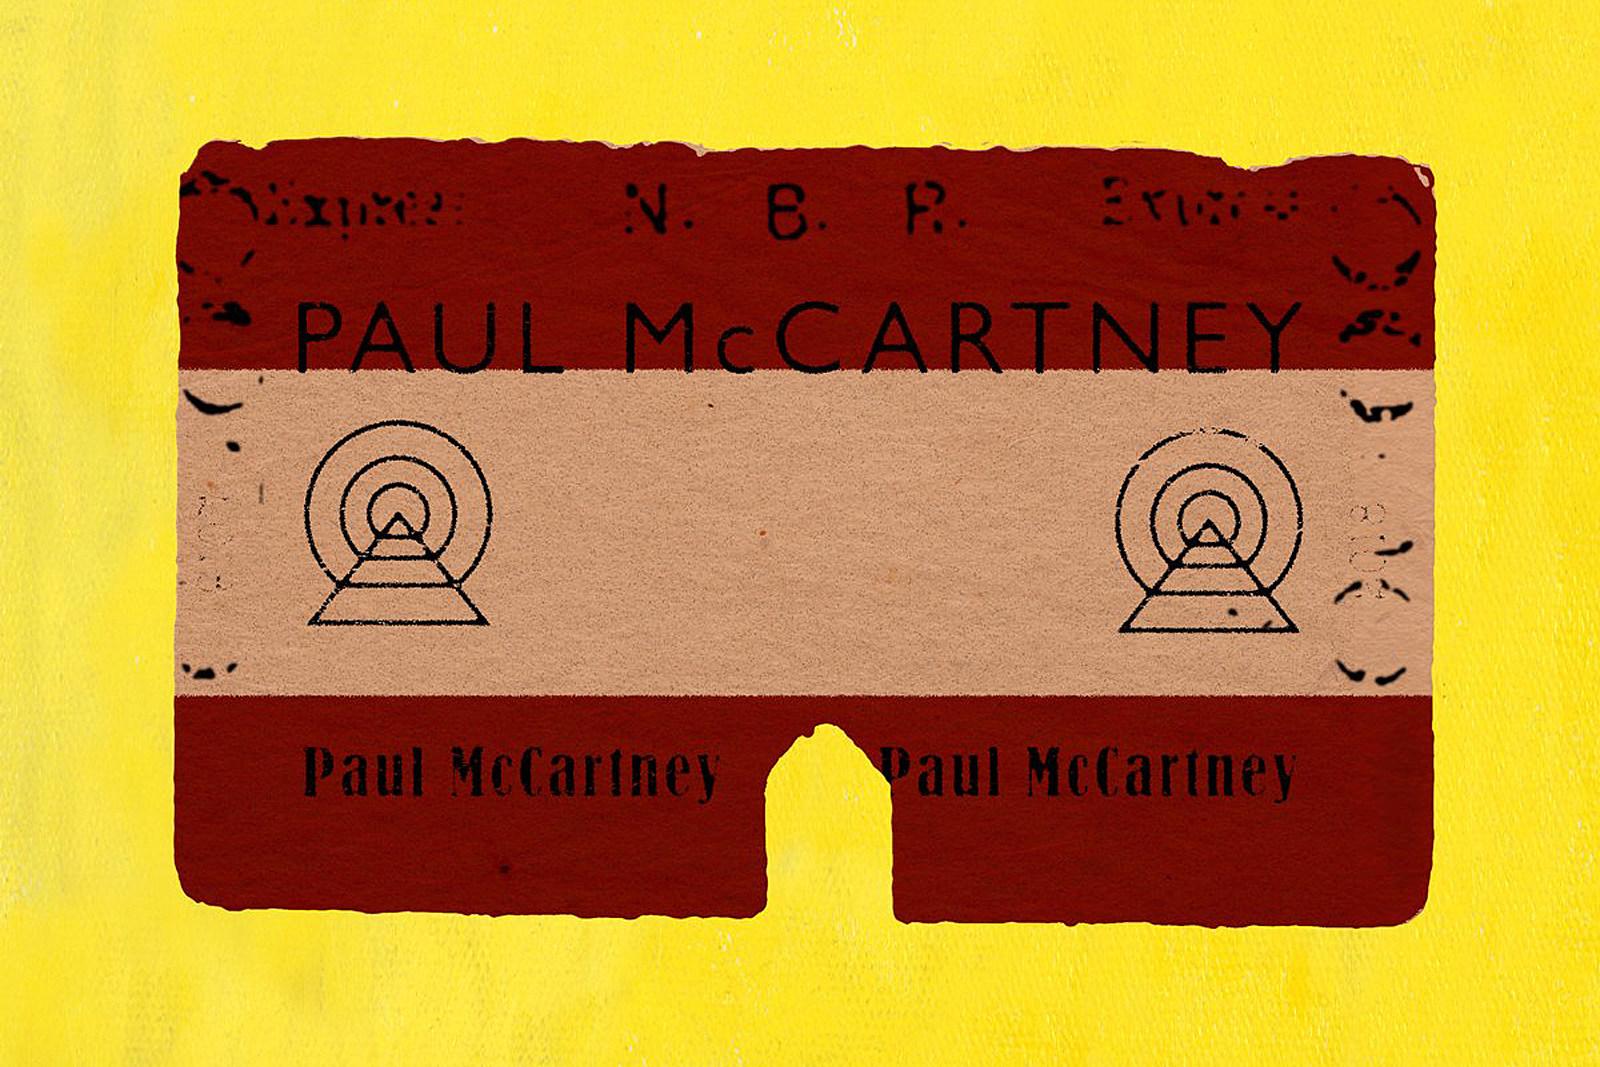 BEATLES PAUL McCARTNEY NAMEPLATE FOR SIGNED PHOTO//RECORD//ALBUM